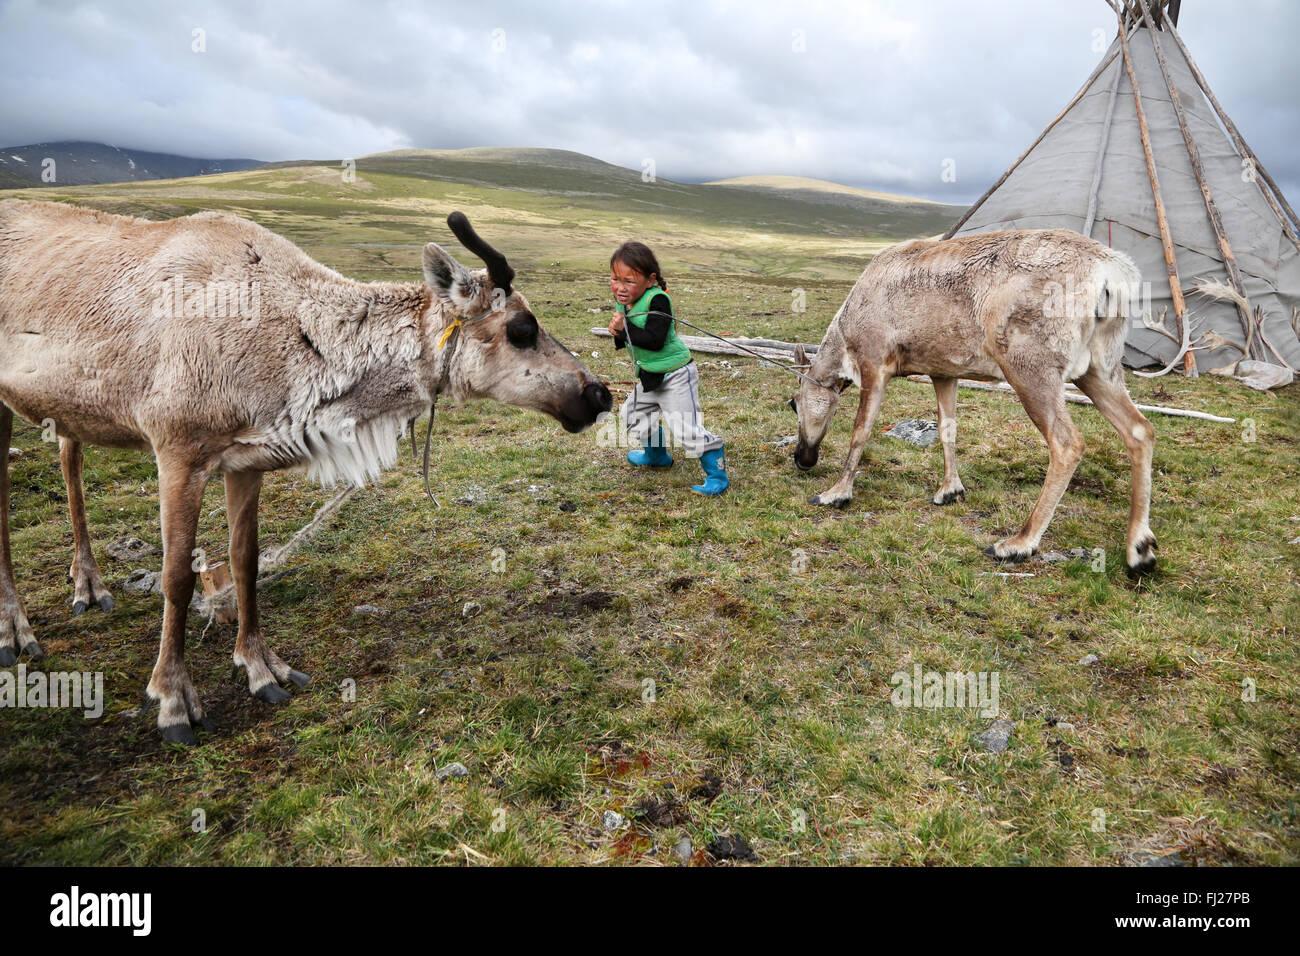 Tsaatan nomad kid giocando con le renne Immagini Stock